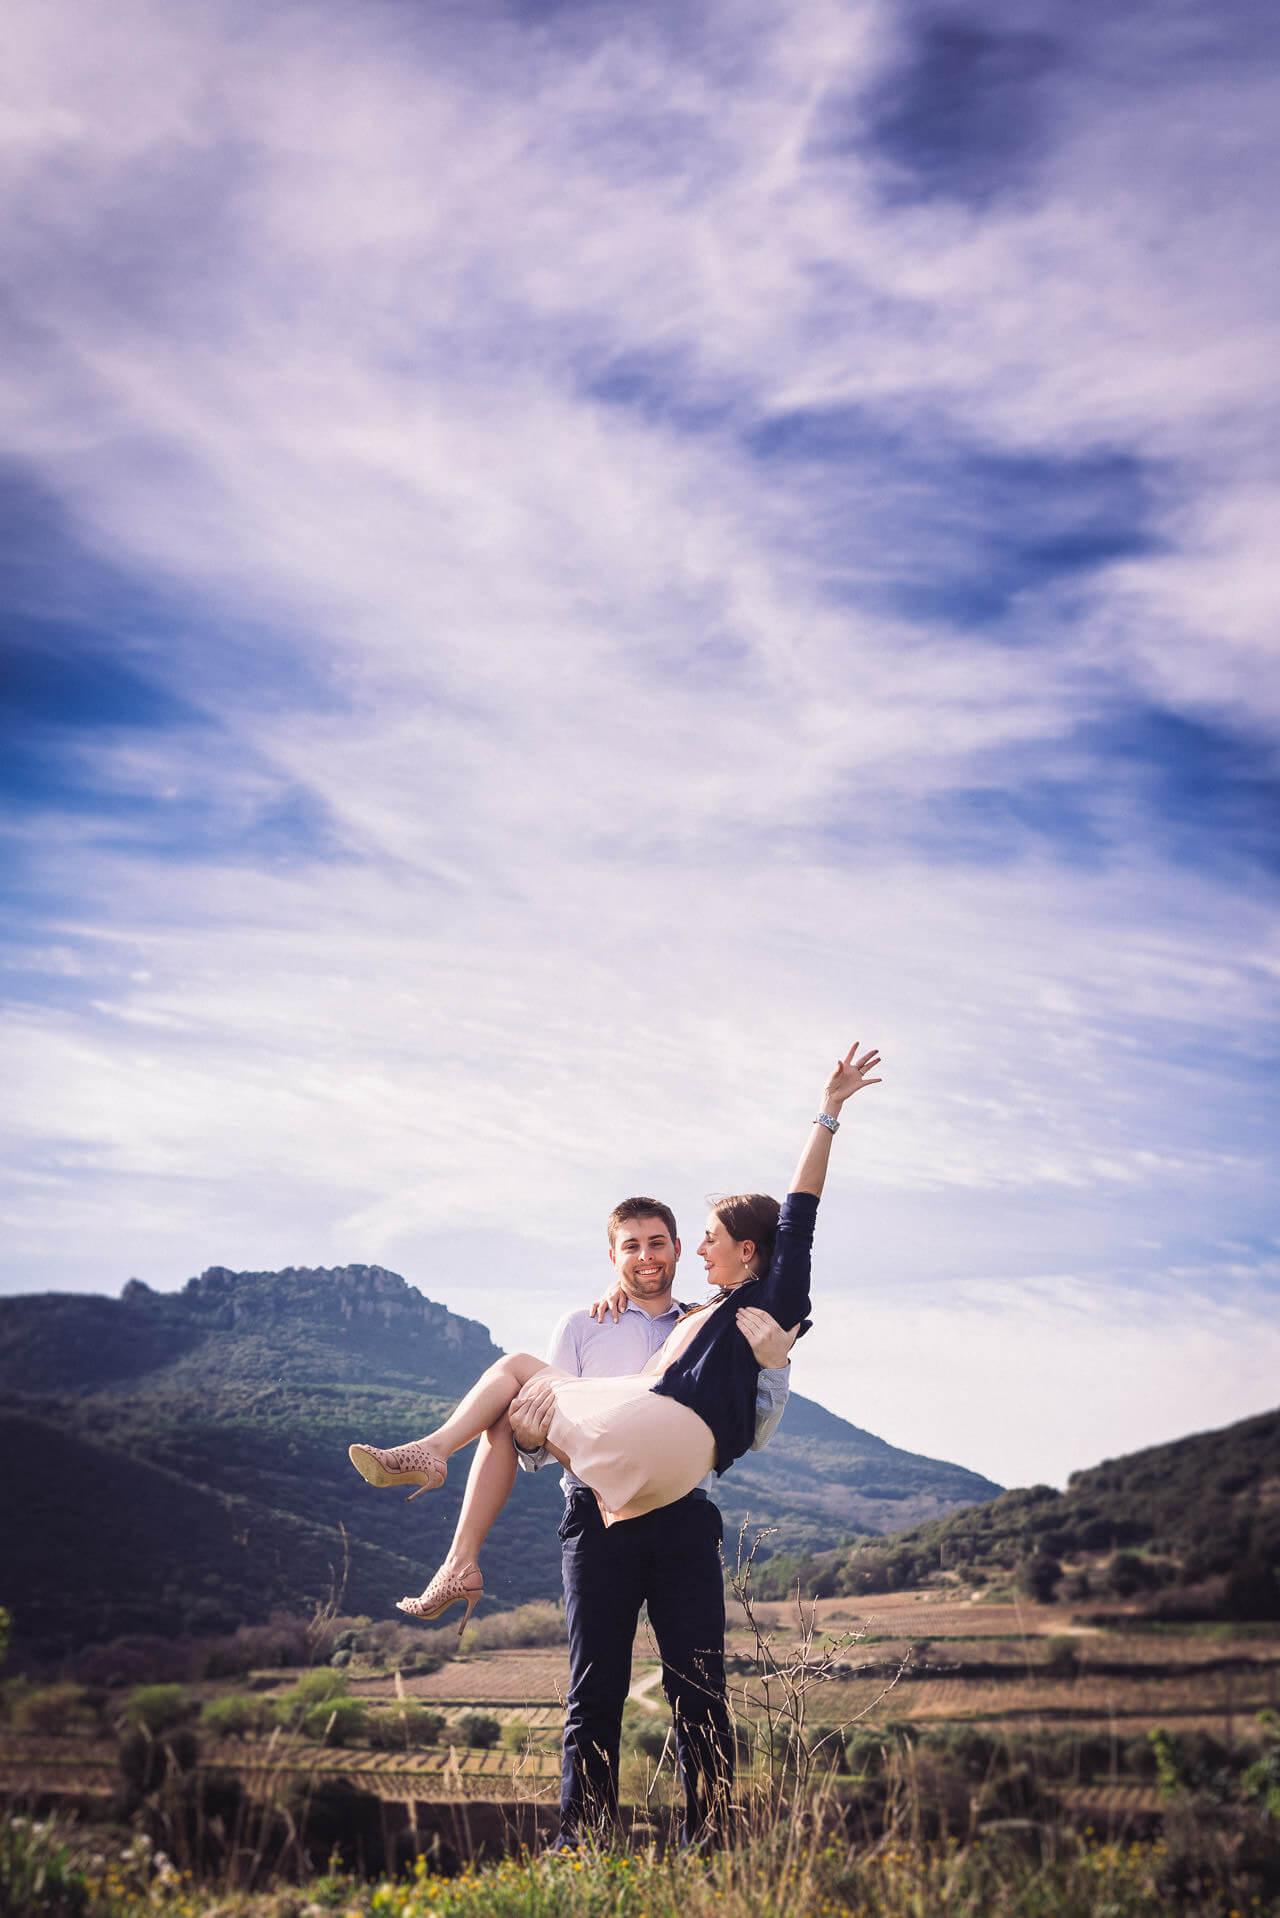 photographe mariage love session herault